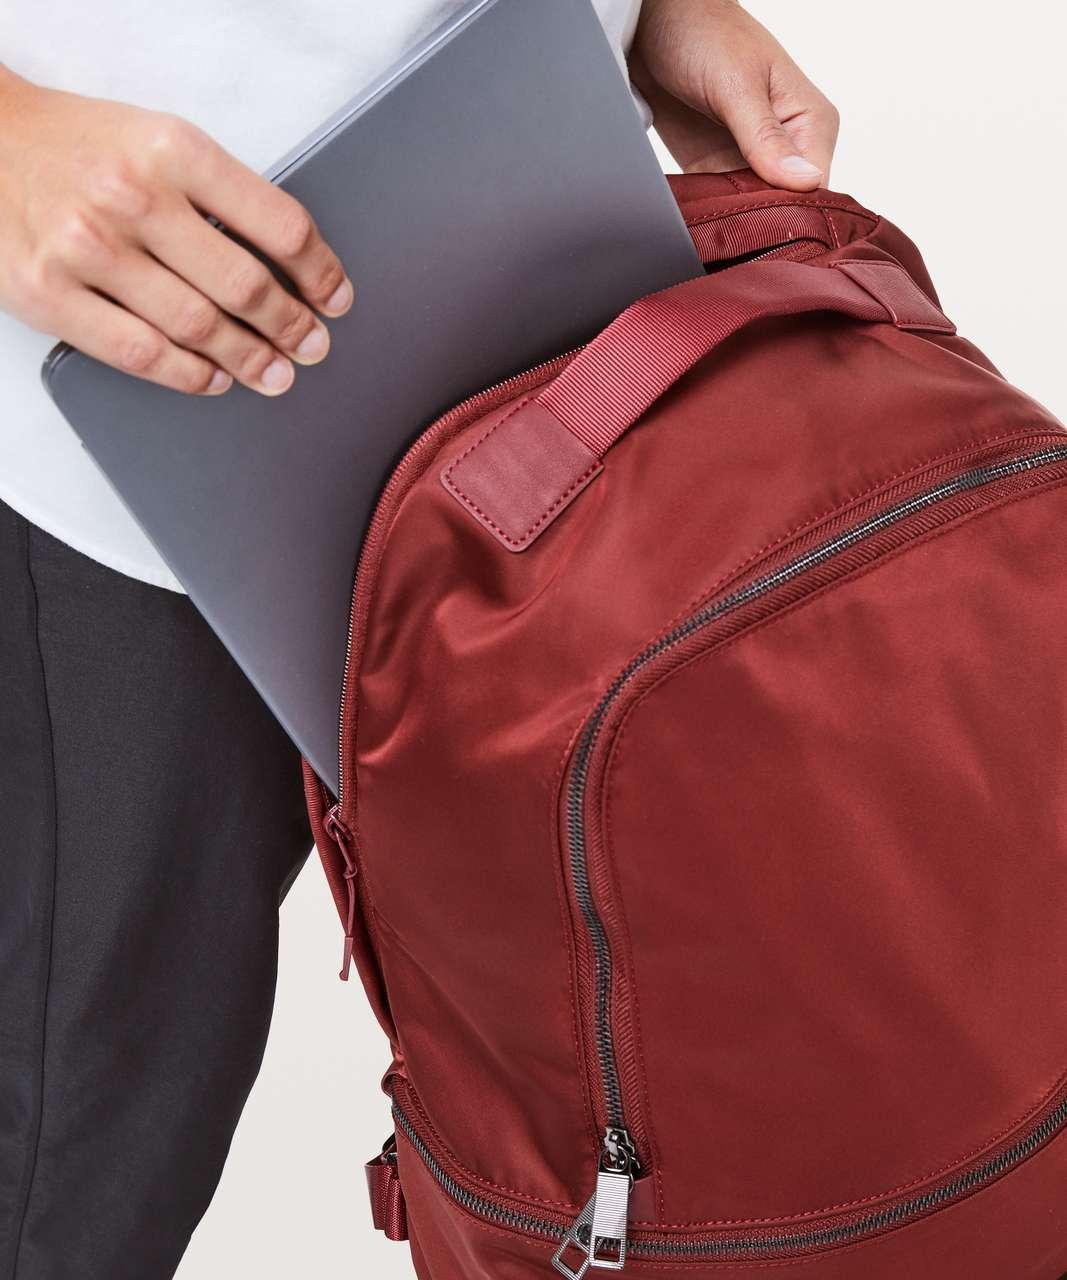 Lululemon City Adventurer Backpack *17L - Roman Red